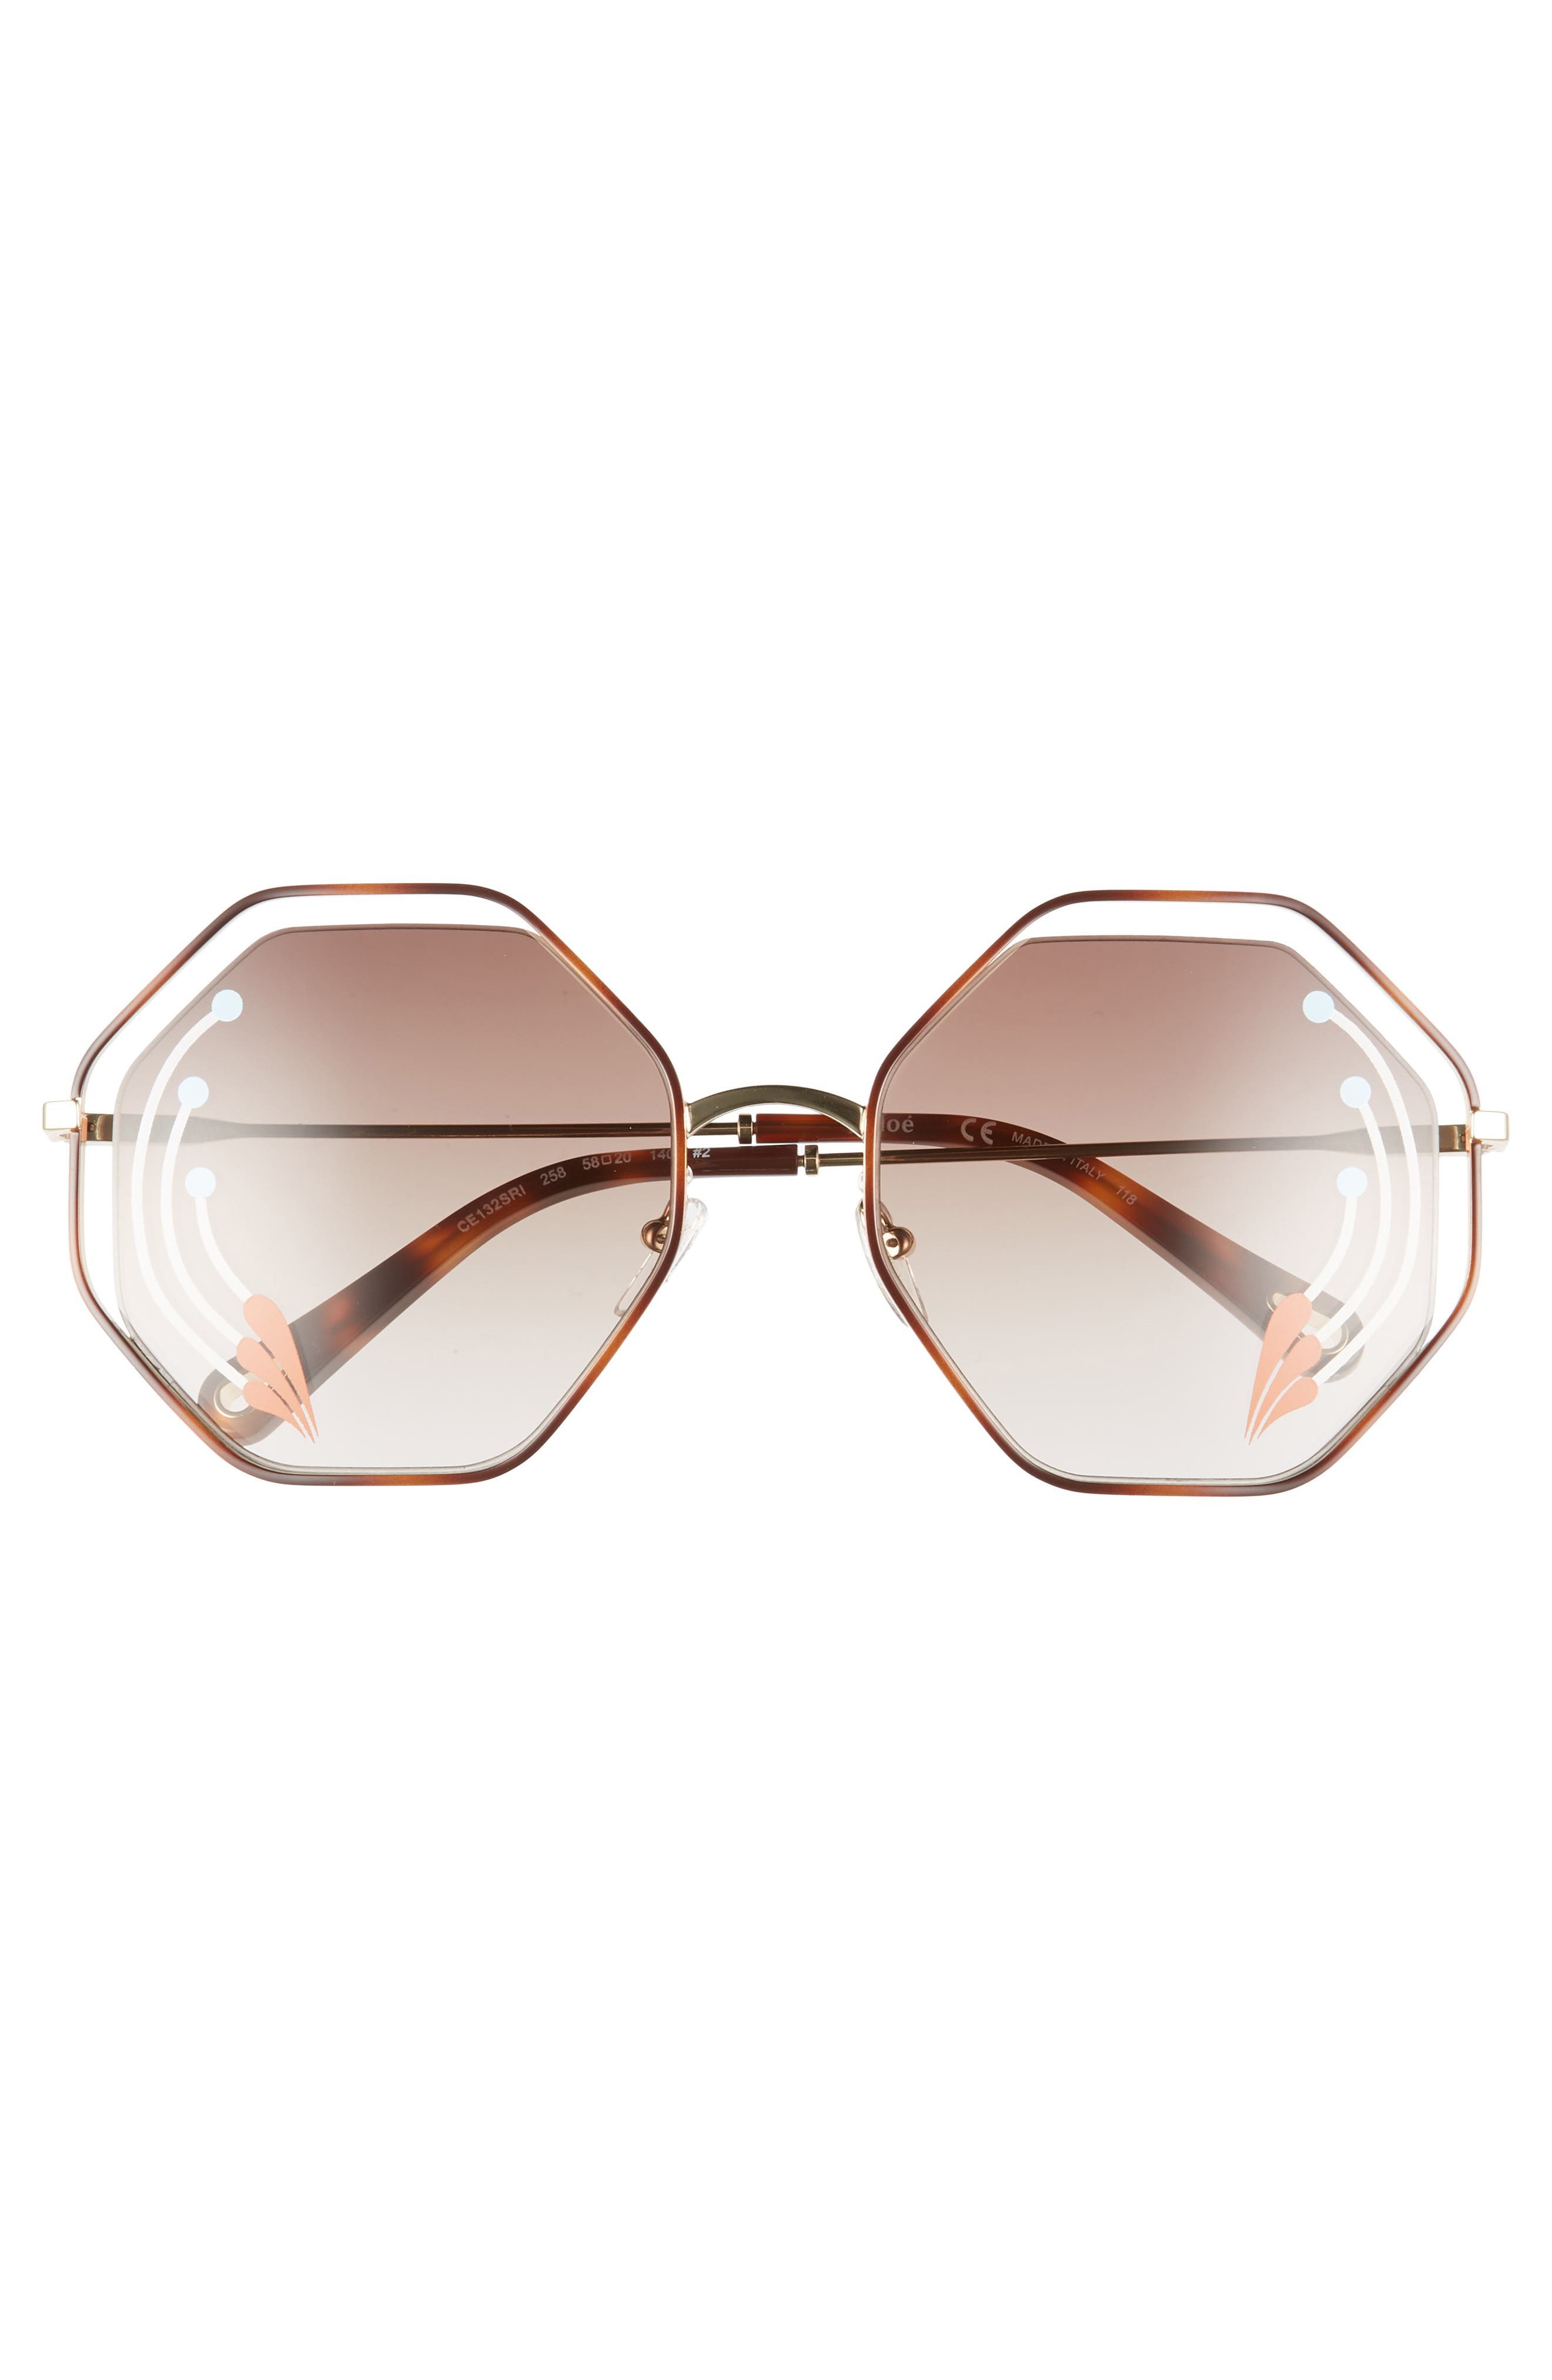 Poppy 58mm Octagonal Halo Lens Sunglasses,                             Alternate thumbnail 3, color,                             HAVANA/ GOLD BROWN W PRINT